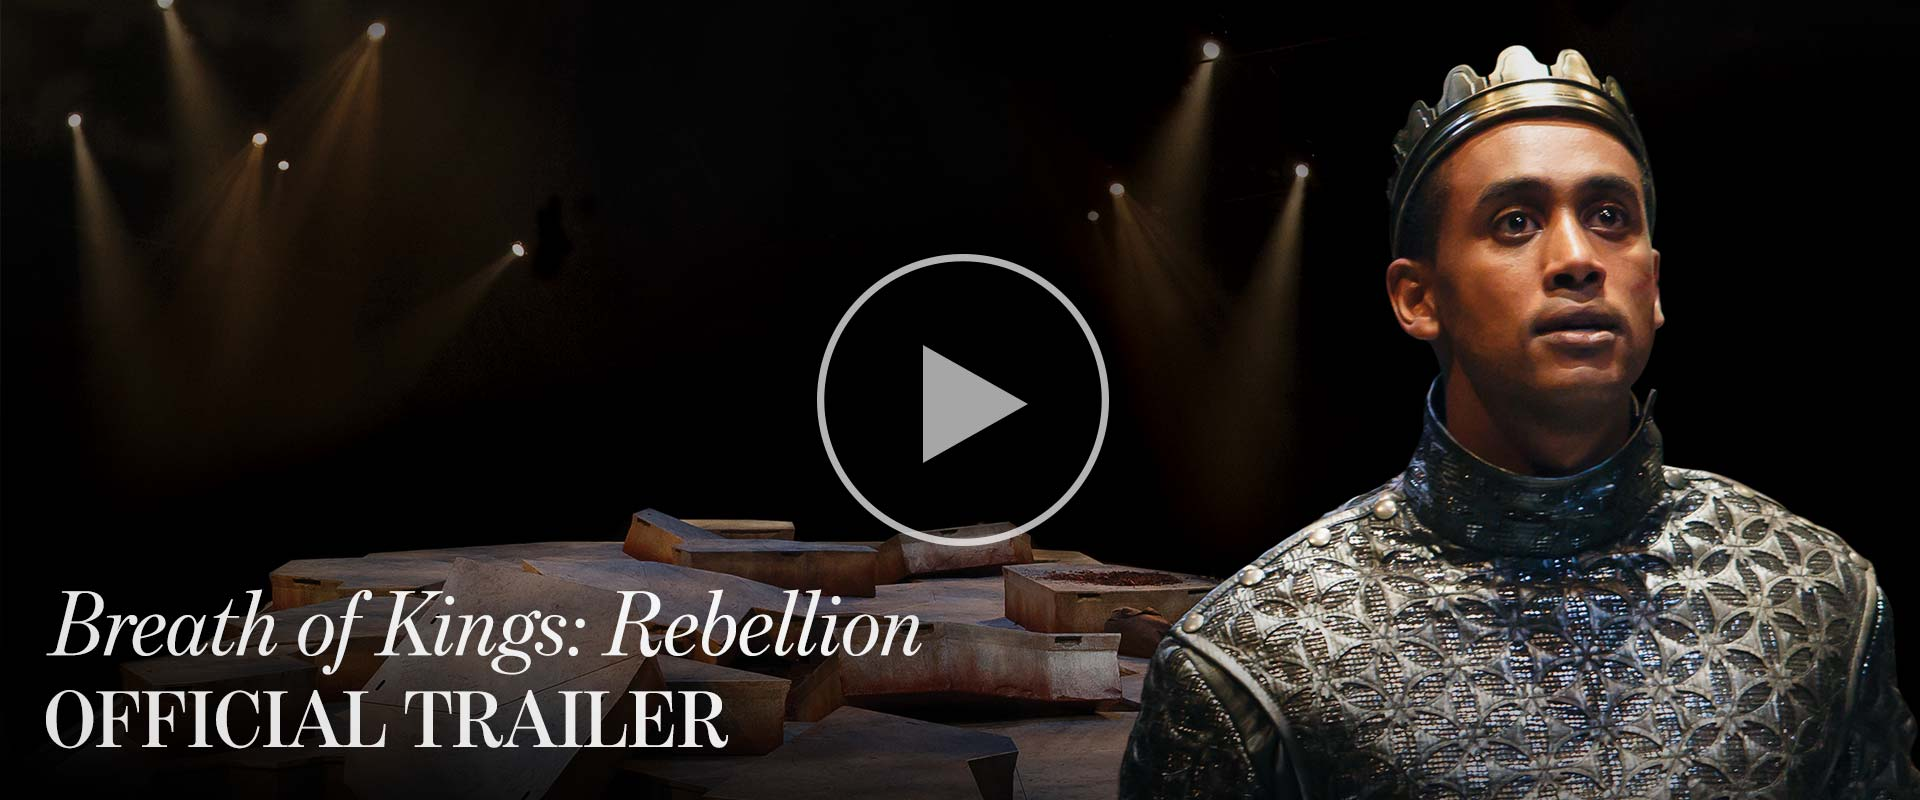 Breath of Kings: Rebellion